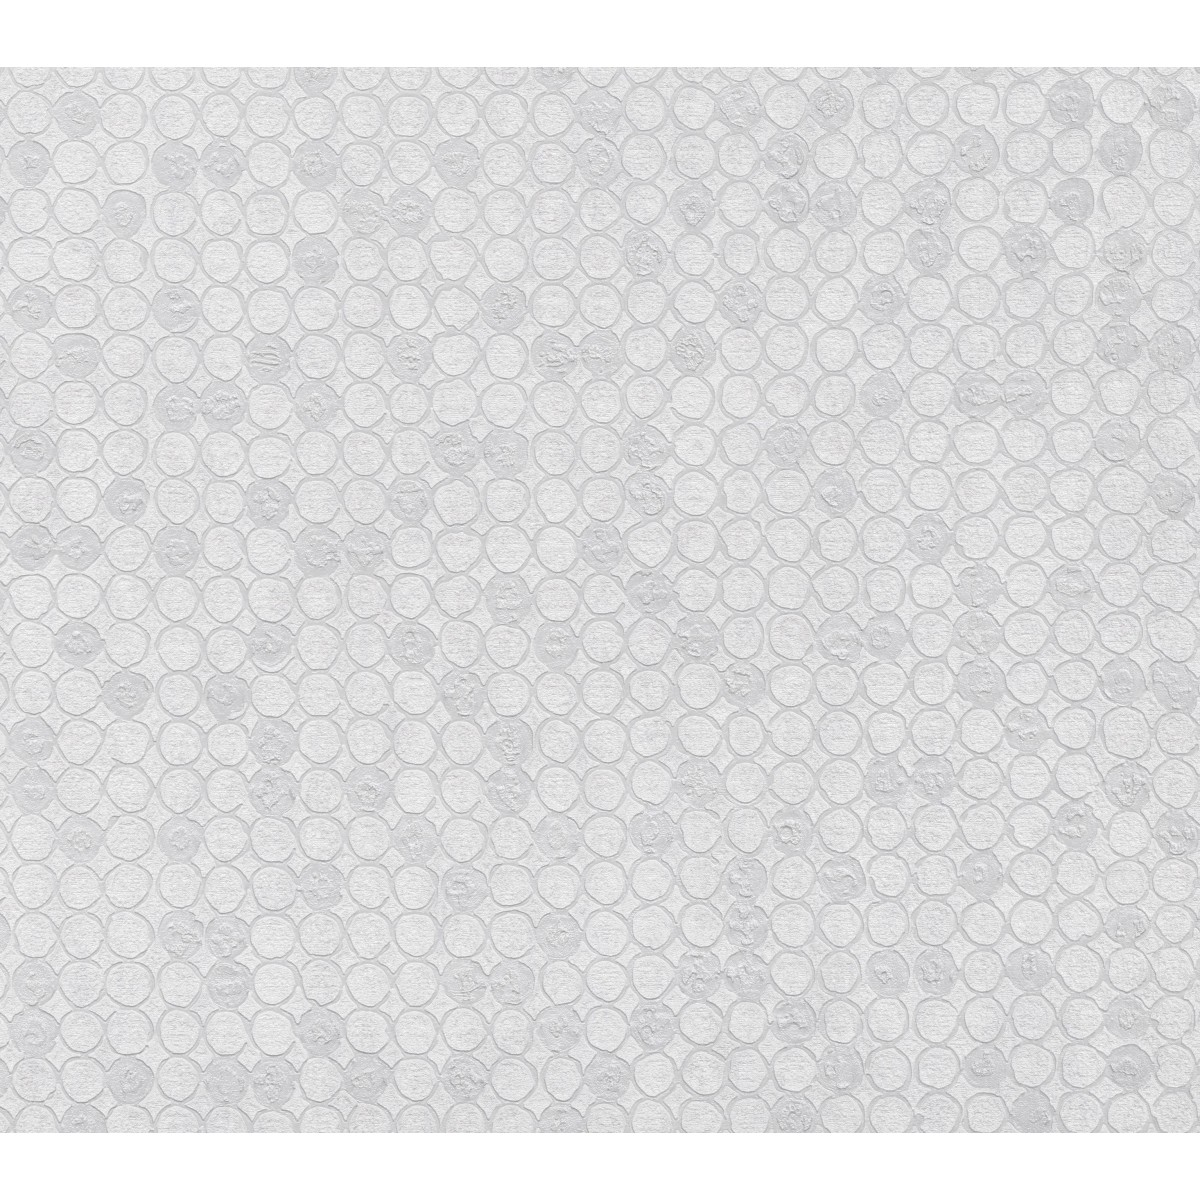 Обои флизелиновые Limonta Italian Wall Couture AURUM белые 1.06 м 56211